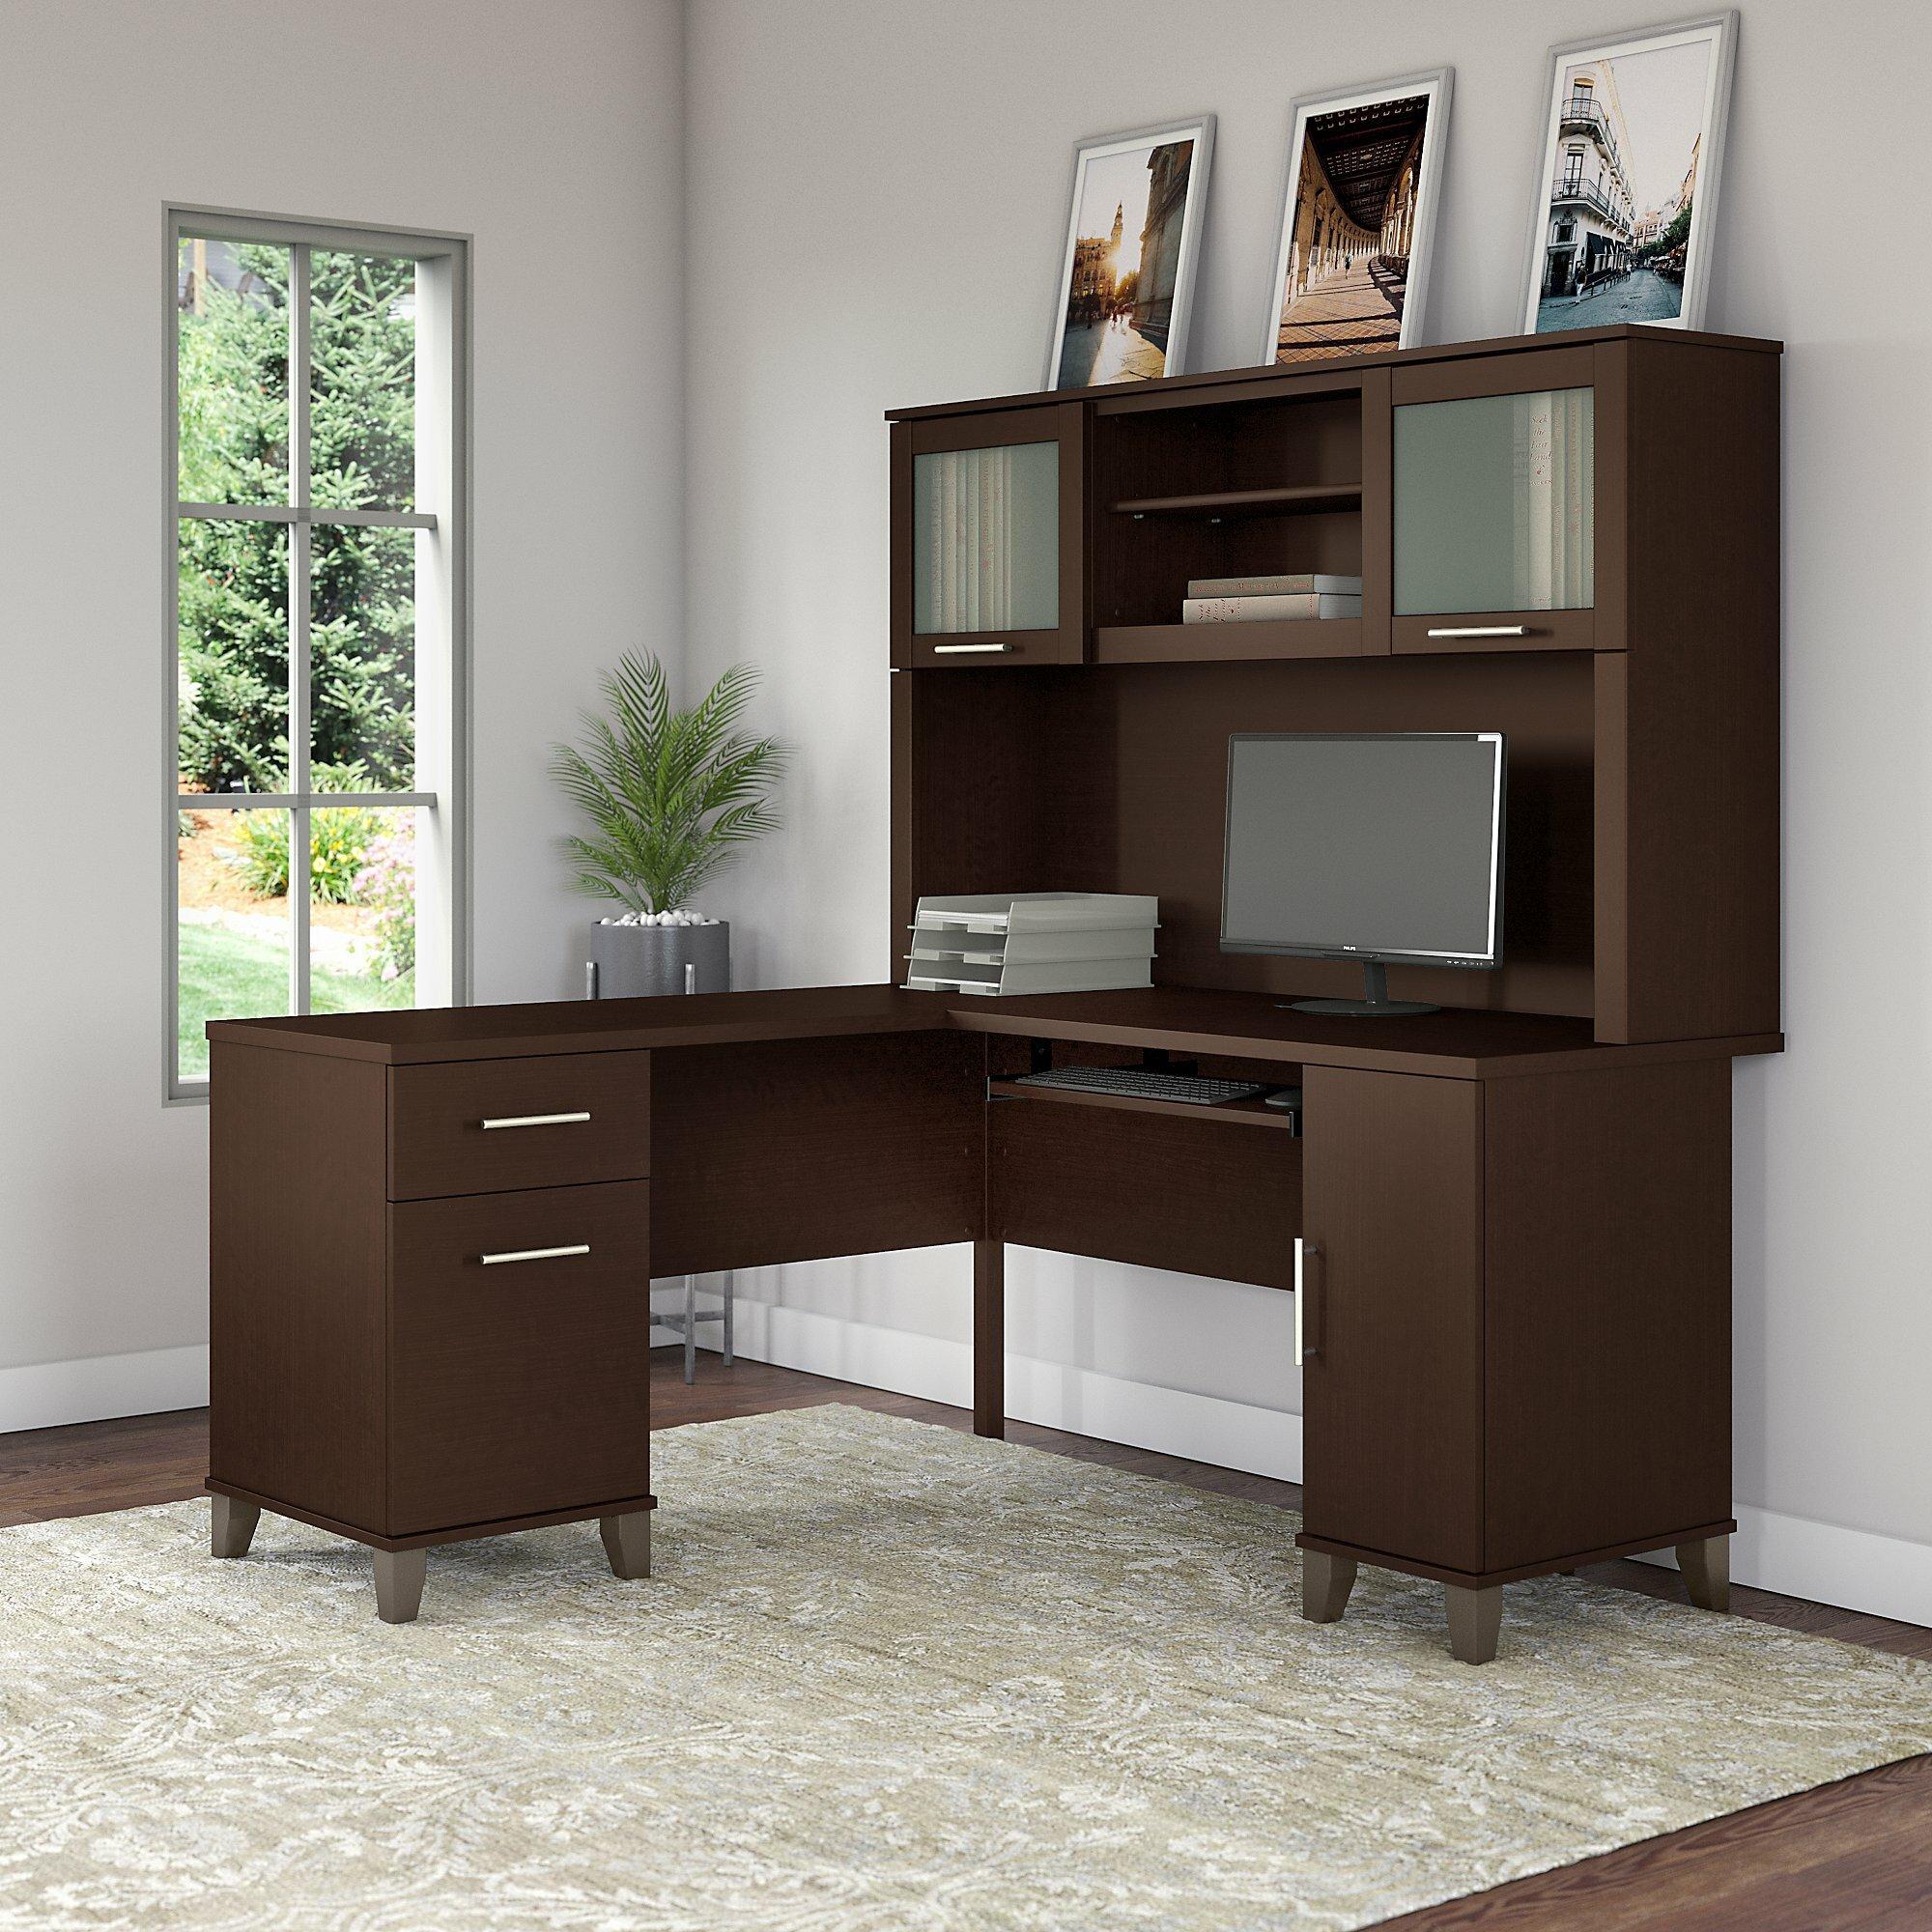 Latitude Run Kittle Somerset L Shaped Executive Desk With Hutch U0026 Reviews |  Wayfair